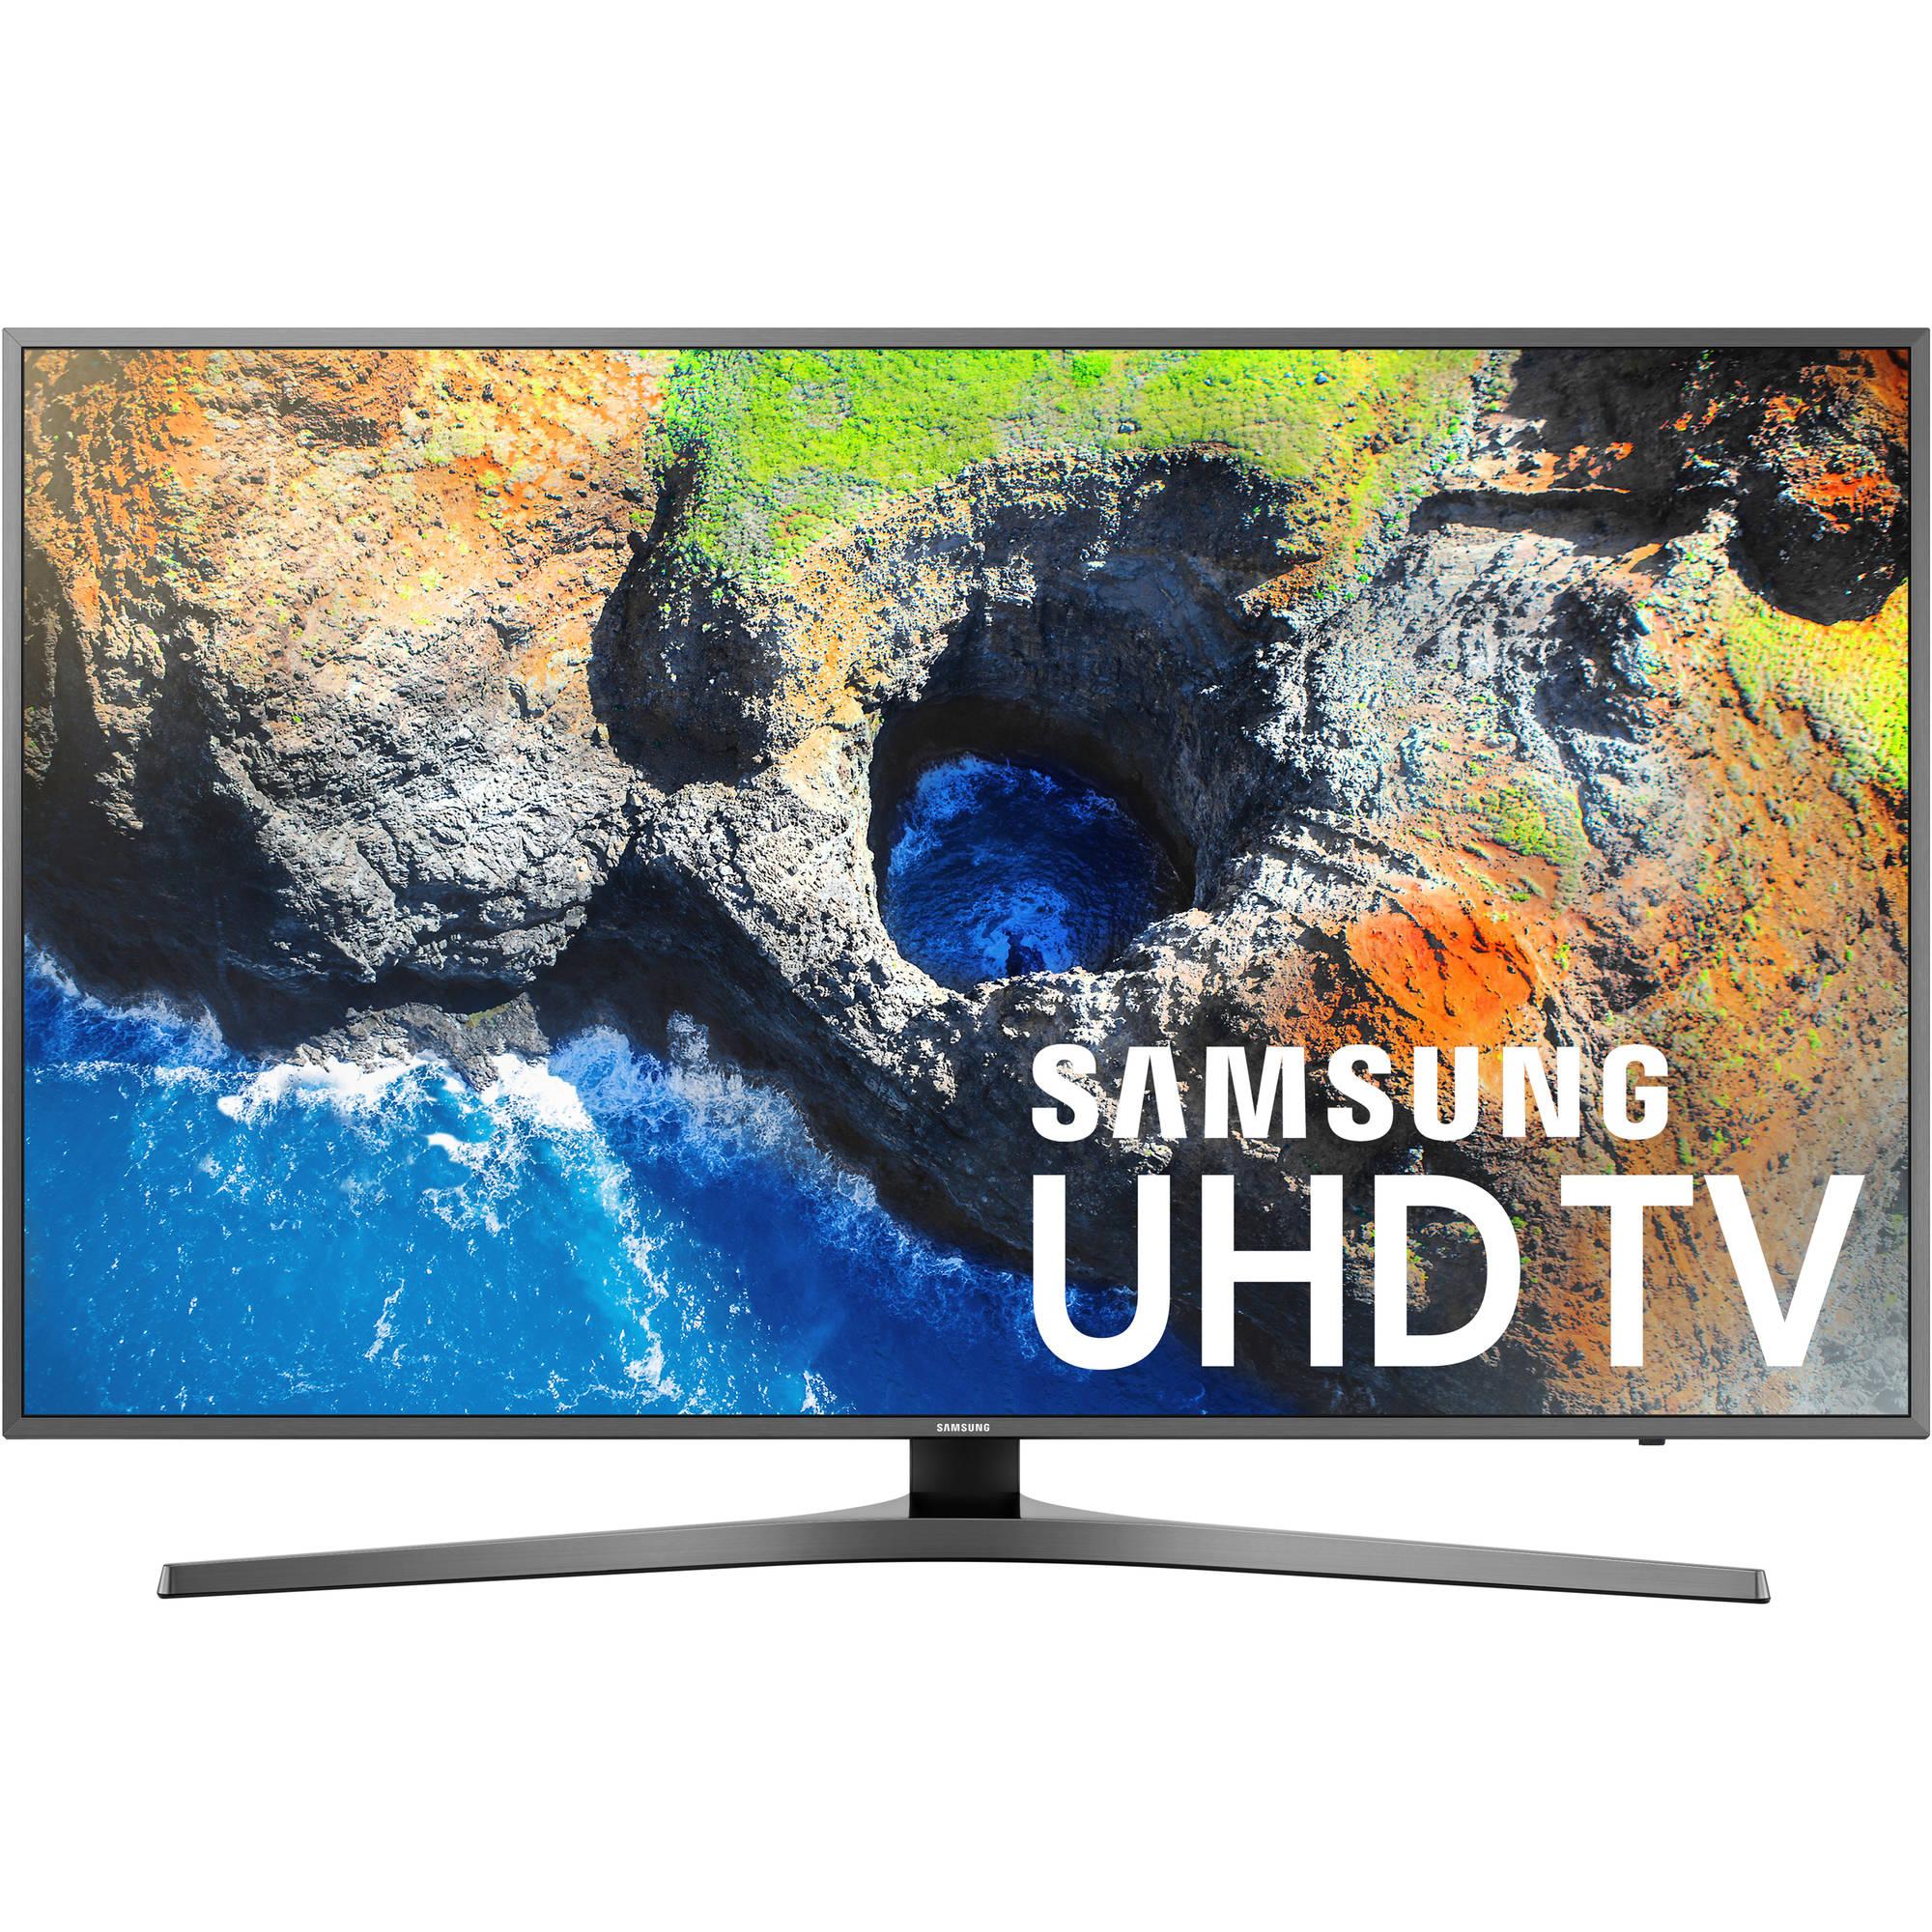 "SAMSUNG 40"" Class 4K (2160P) Ultra HD Smart LED TV (UN40MU7000FXZA)"